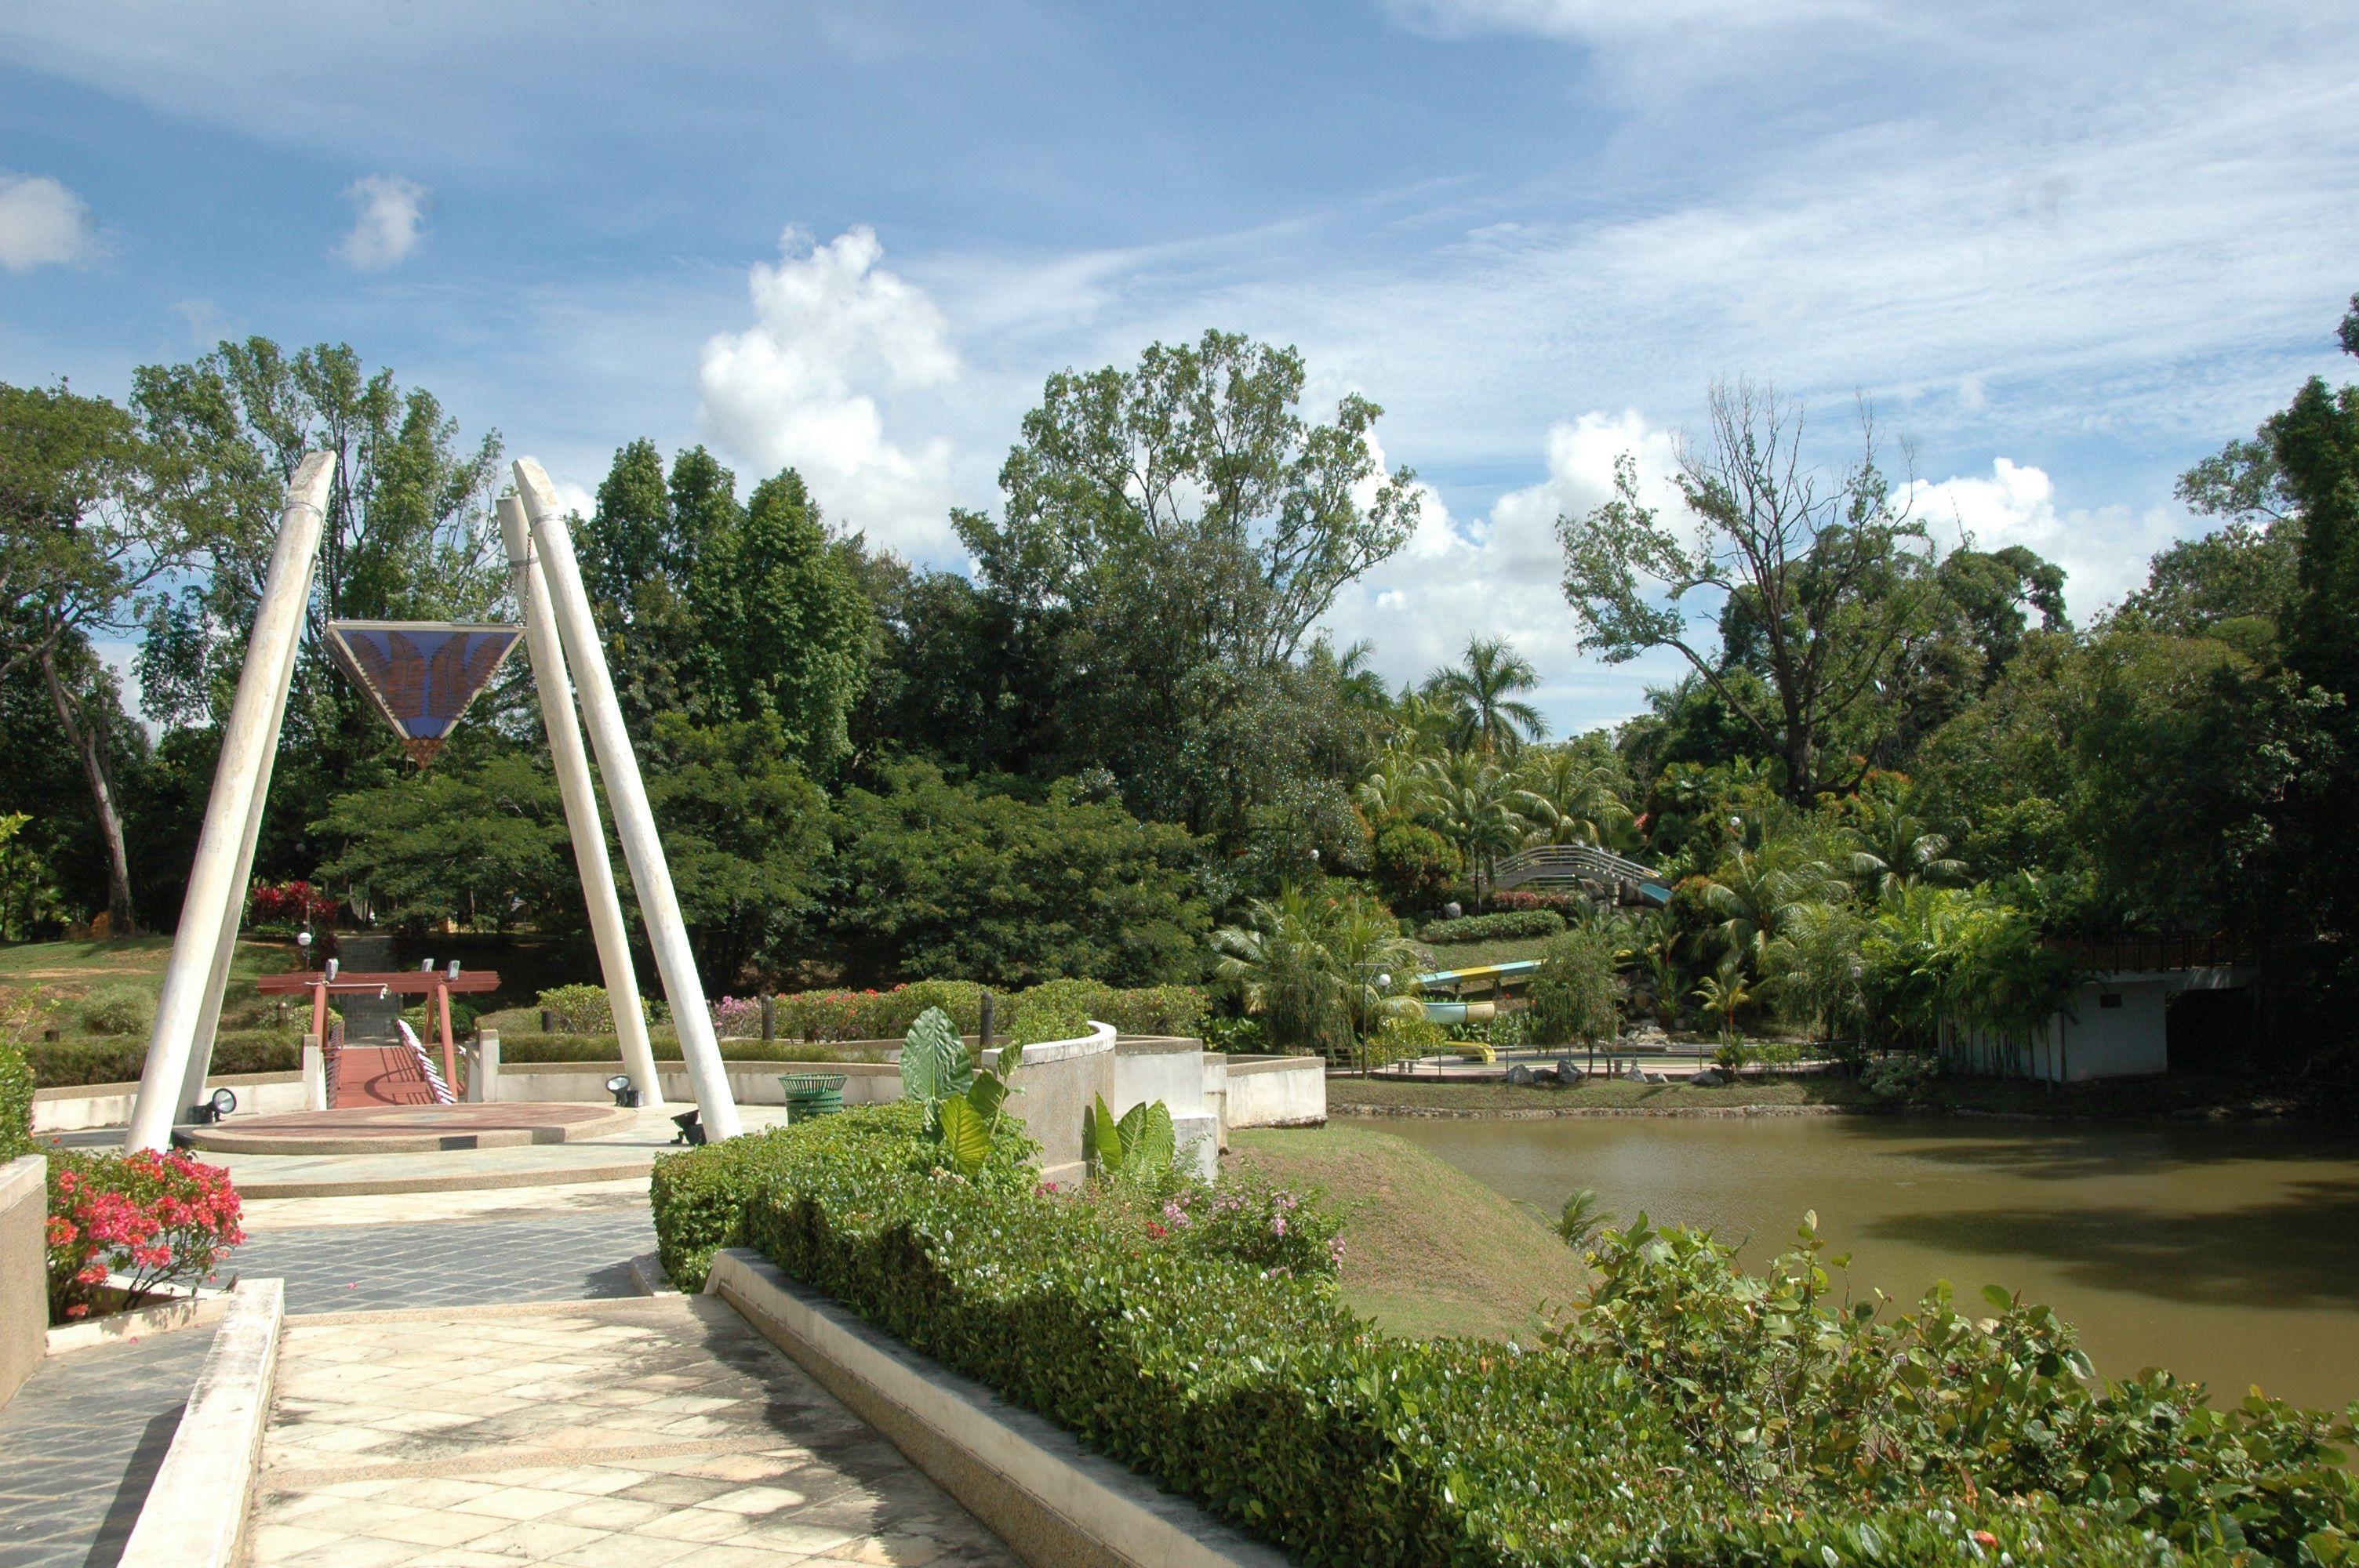 Botanical Gardens in Labaun, Malaysia